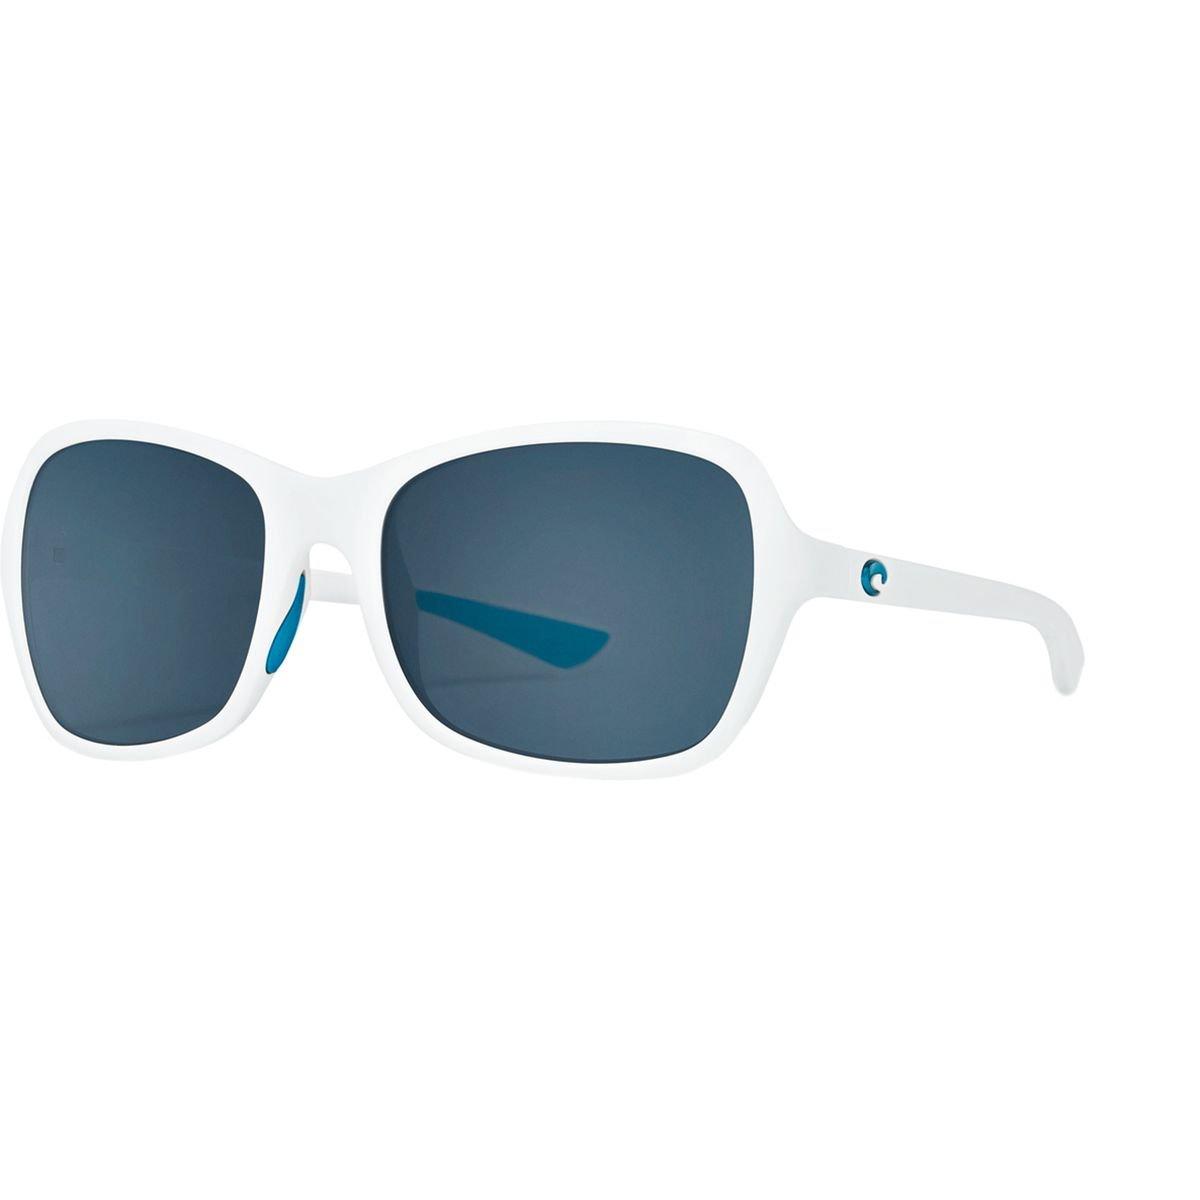 661eb0c2b1b9 Costa Del Mar KAR138OGP Kare Sunglass, Great White Ocearch Gray, Safety  Gear - Amazon Canada